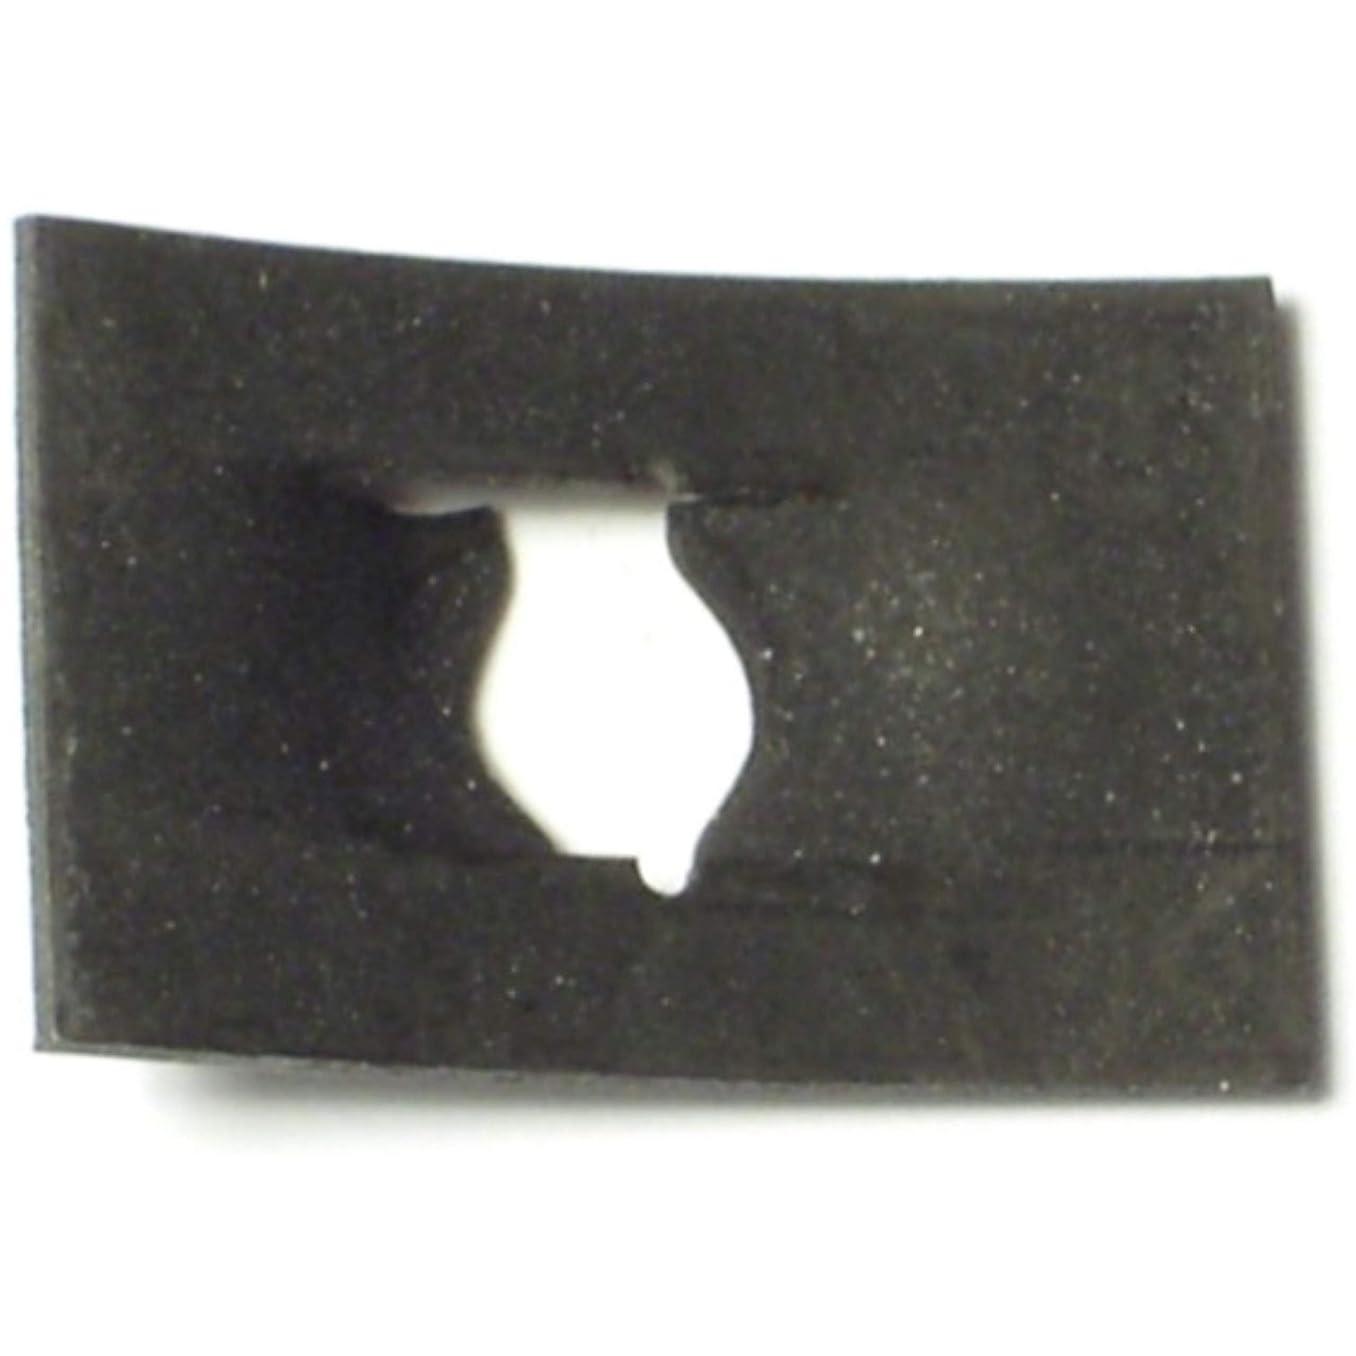 Hard-to-Find Fastener 014973324384 Flat Speed Nuts for Sheet Metal Screws, 14, Piece-24